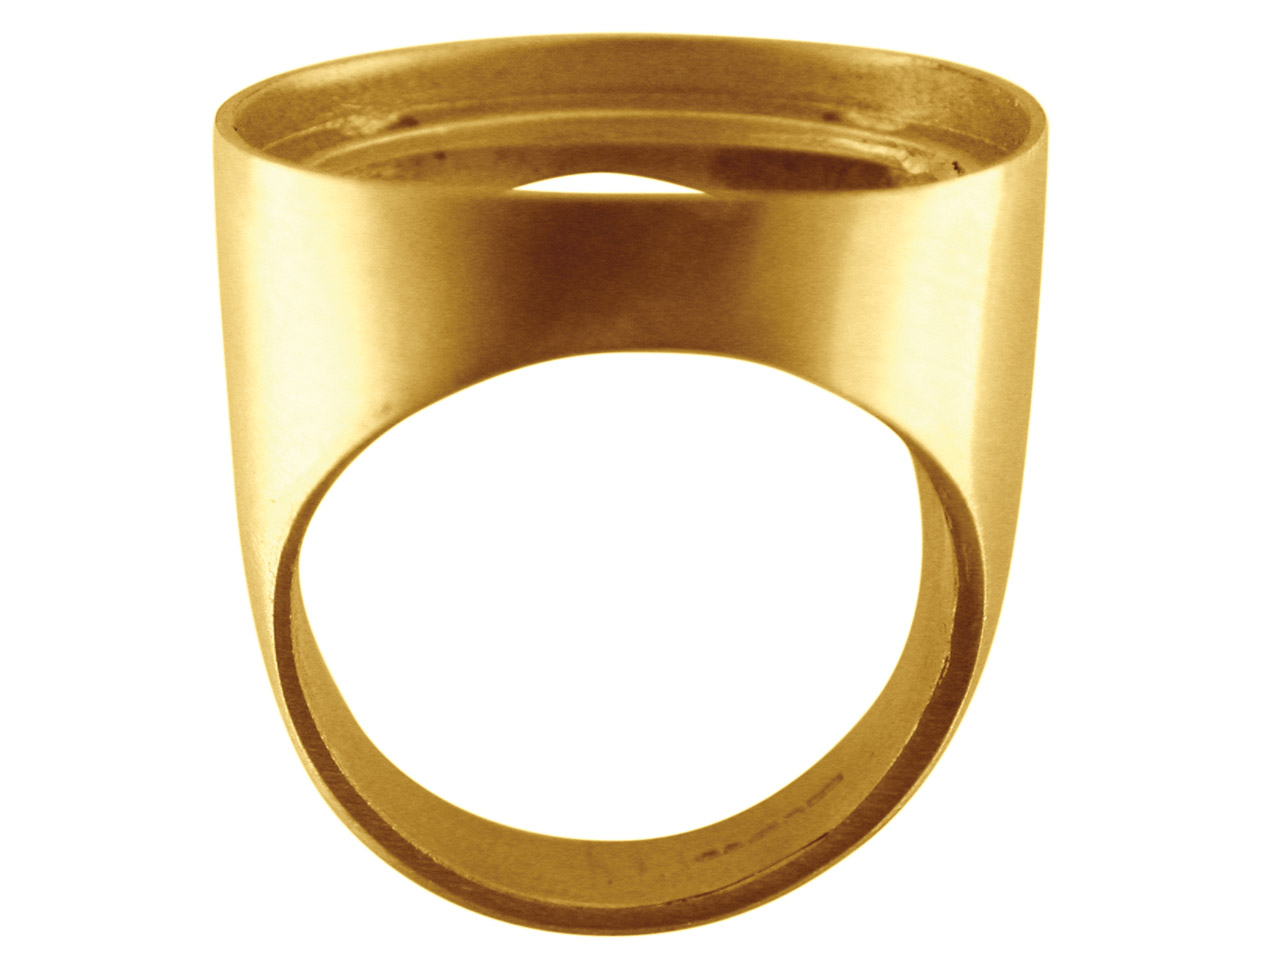 1//2 9ct YELLOW GOLD HALF SOVEREIGN DIAMOND CUT FOUR CLAW COIN BEZEL